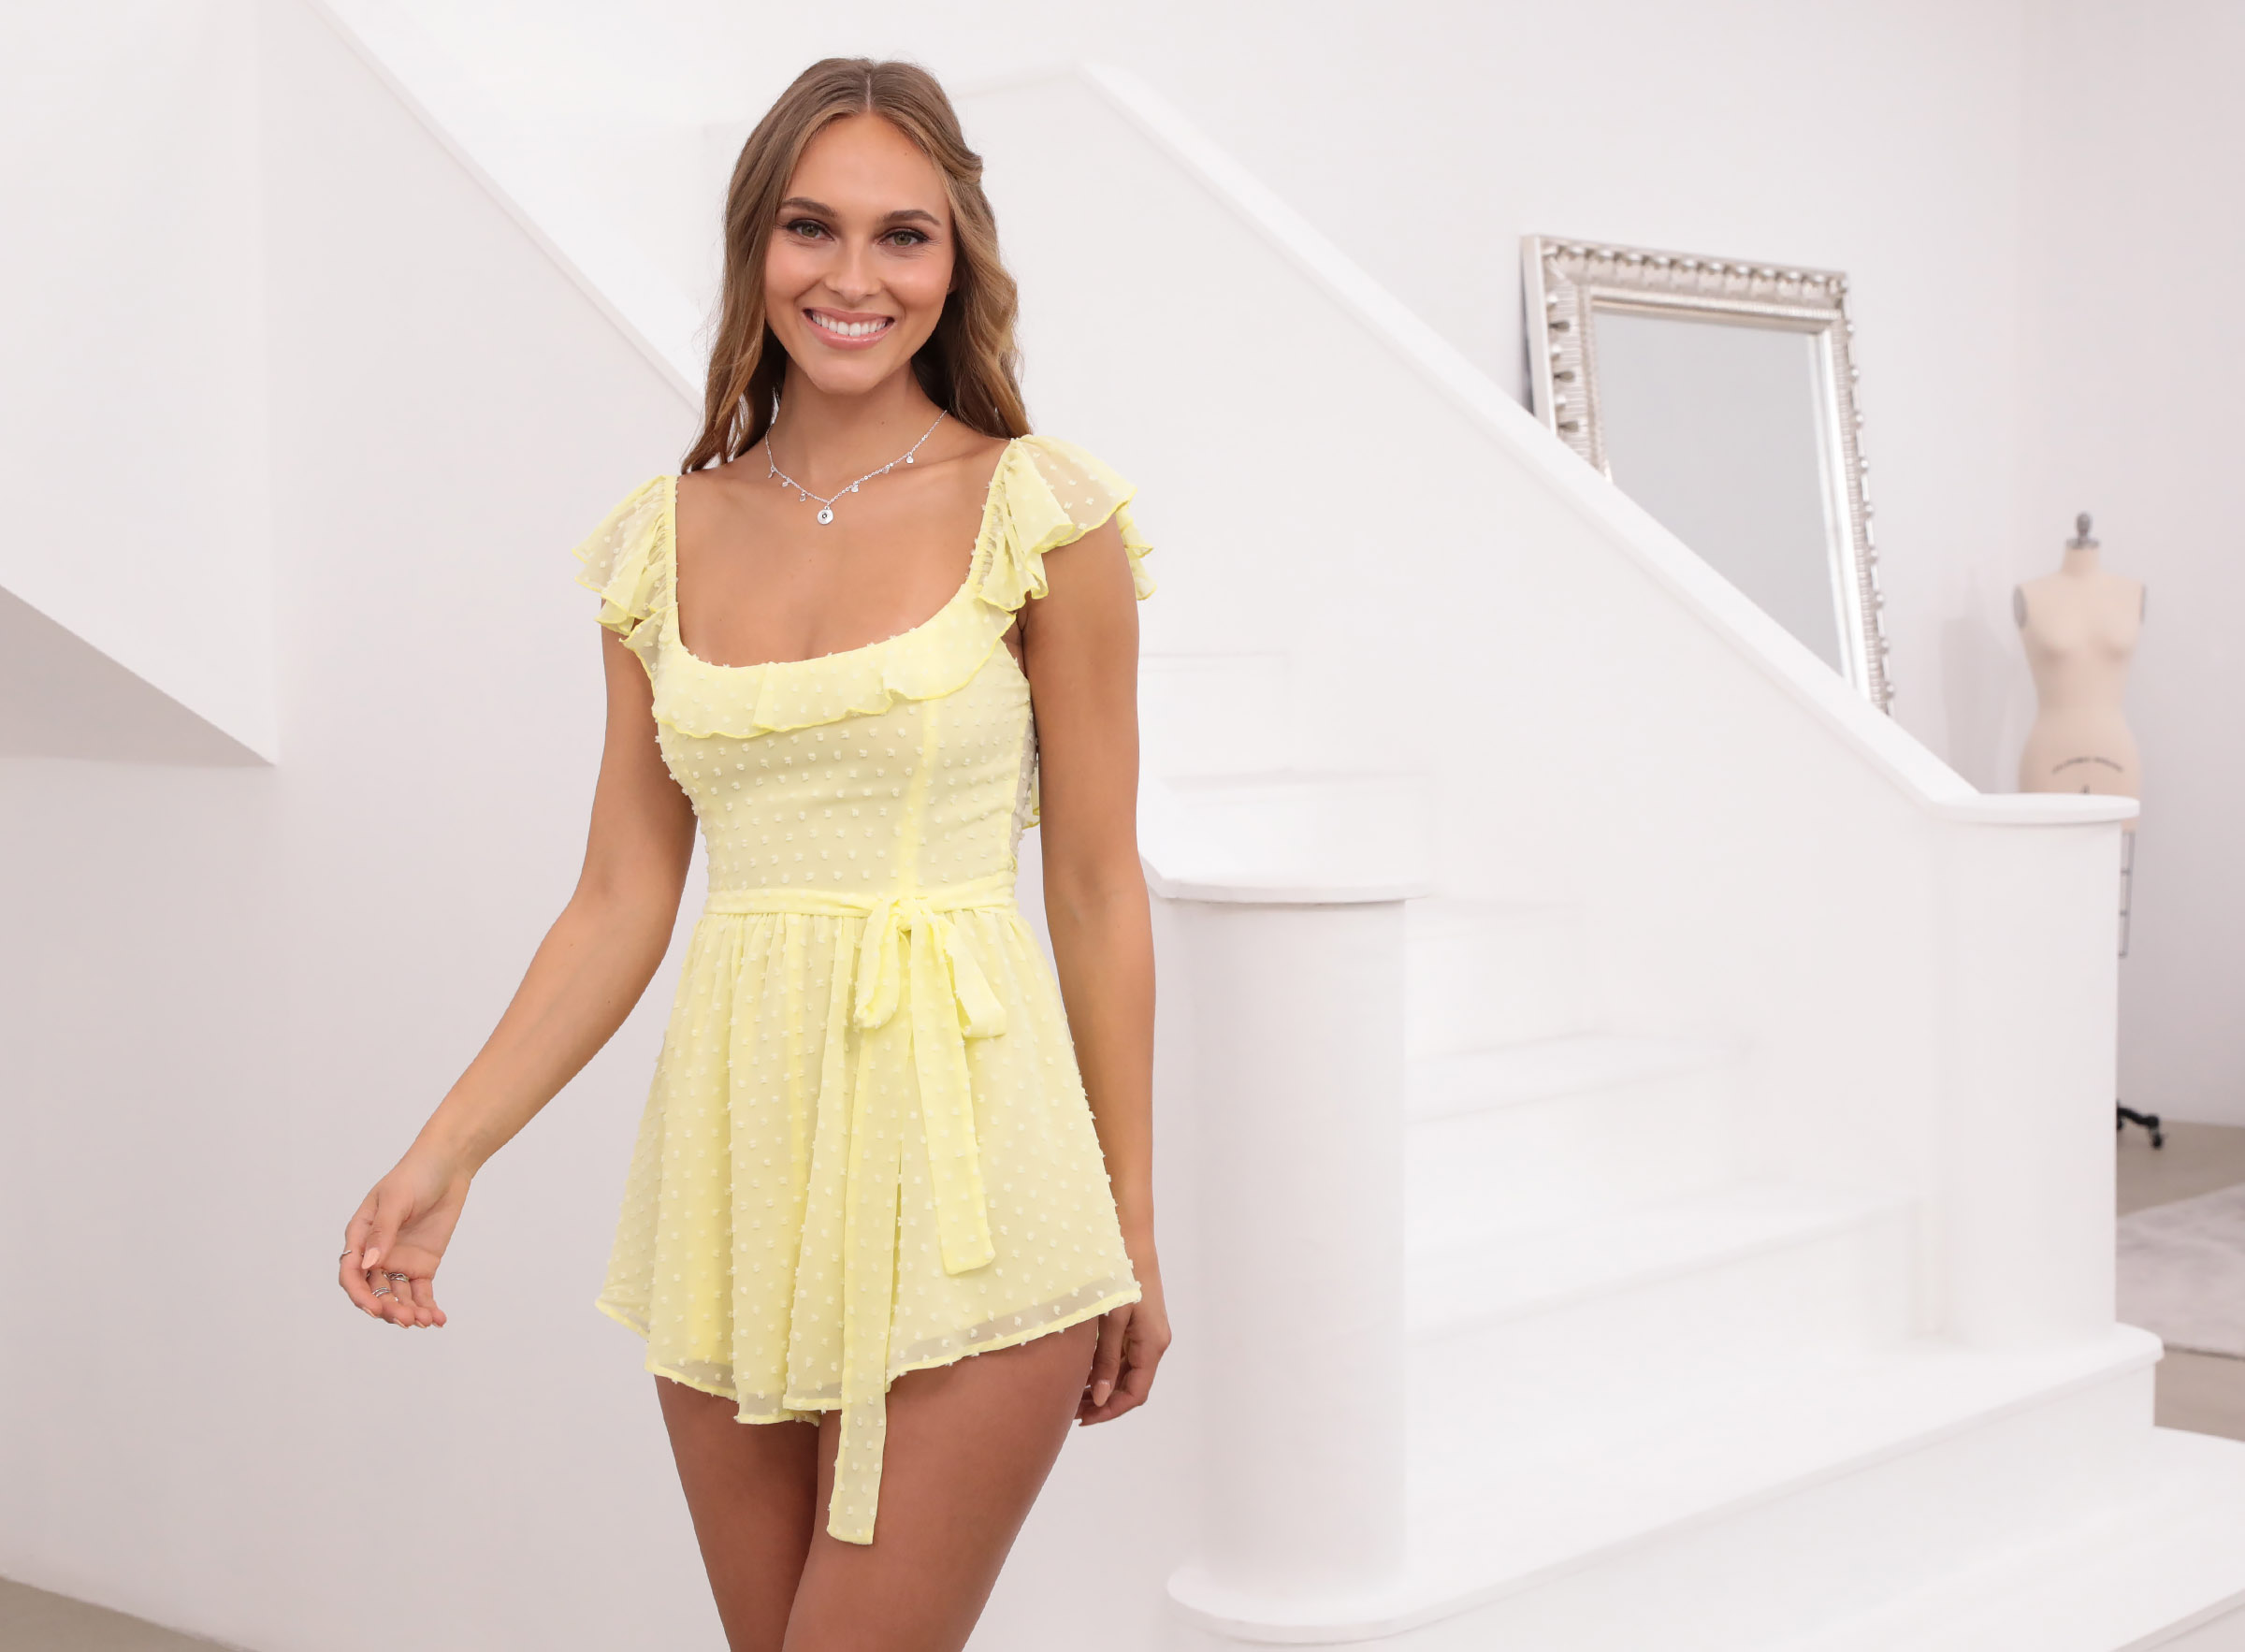 Effie Polka Dot Chiffon Romper in Yellow